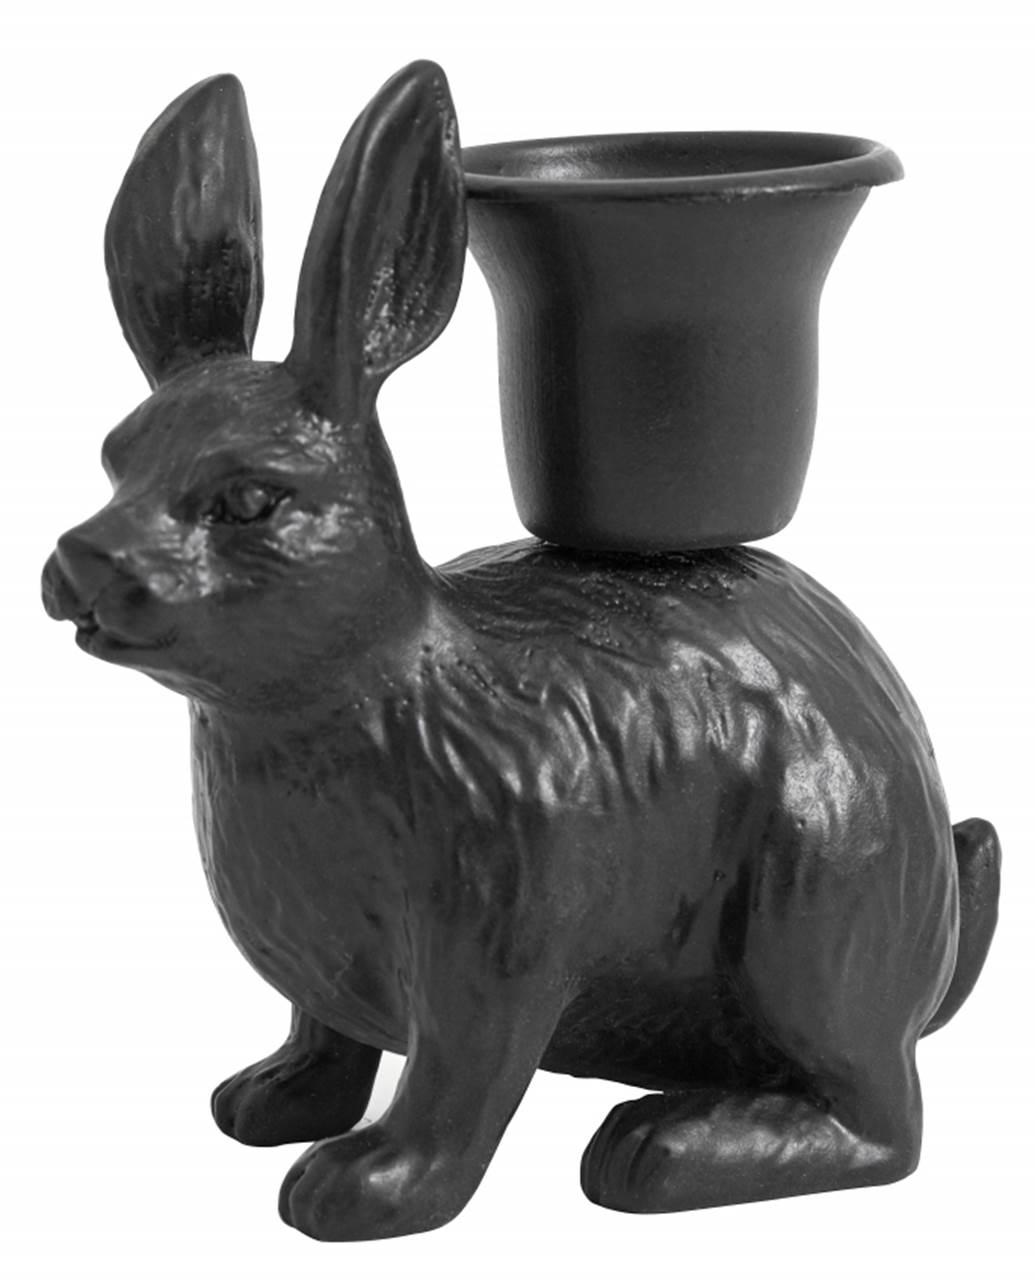 Kanin ljoshaldar i jern - Nordal